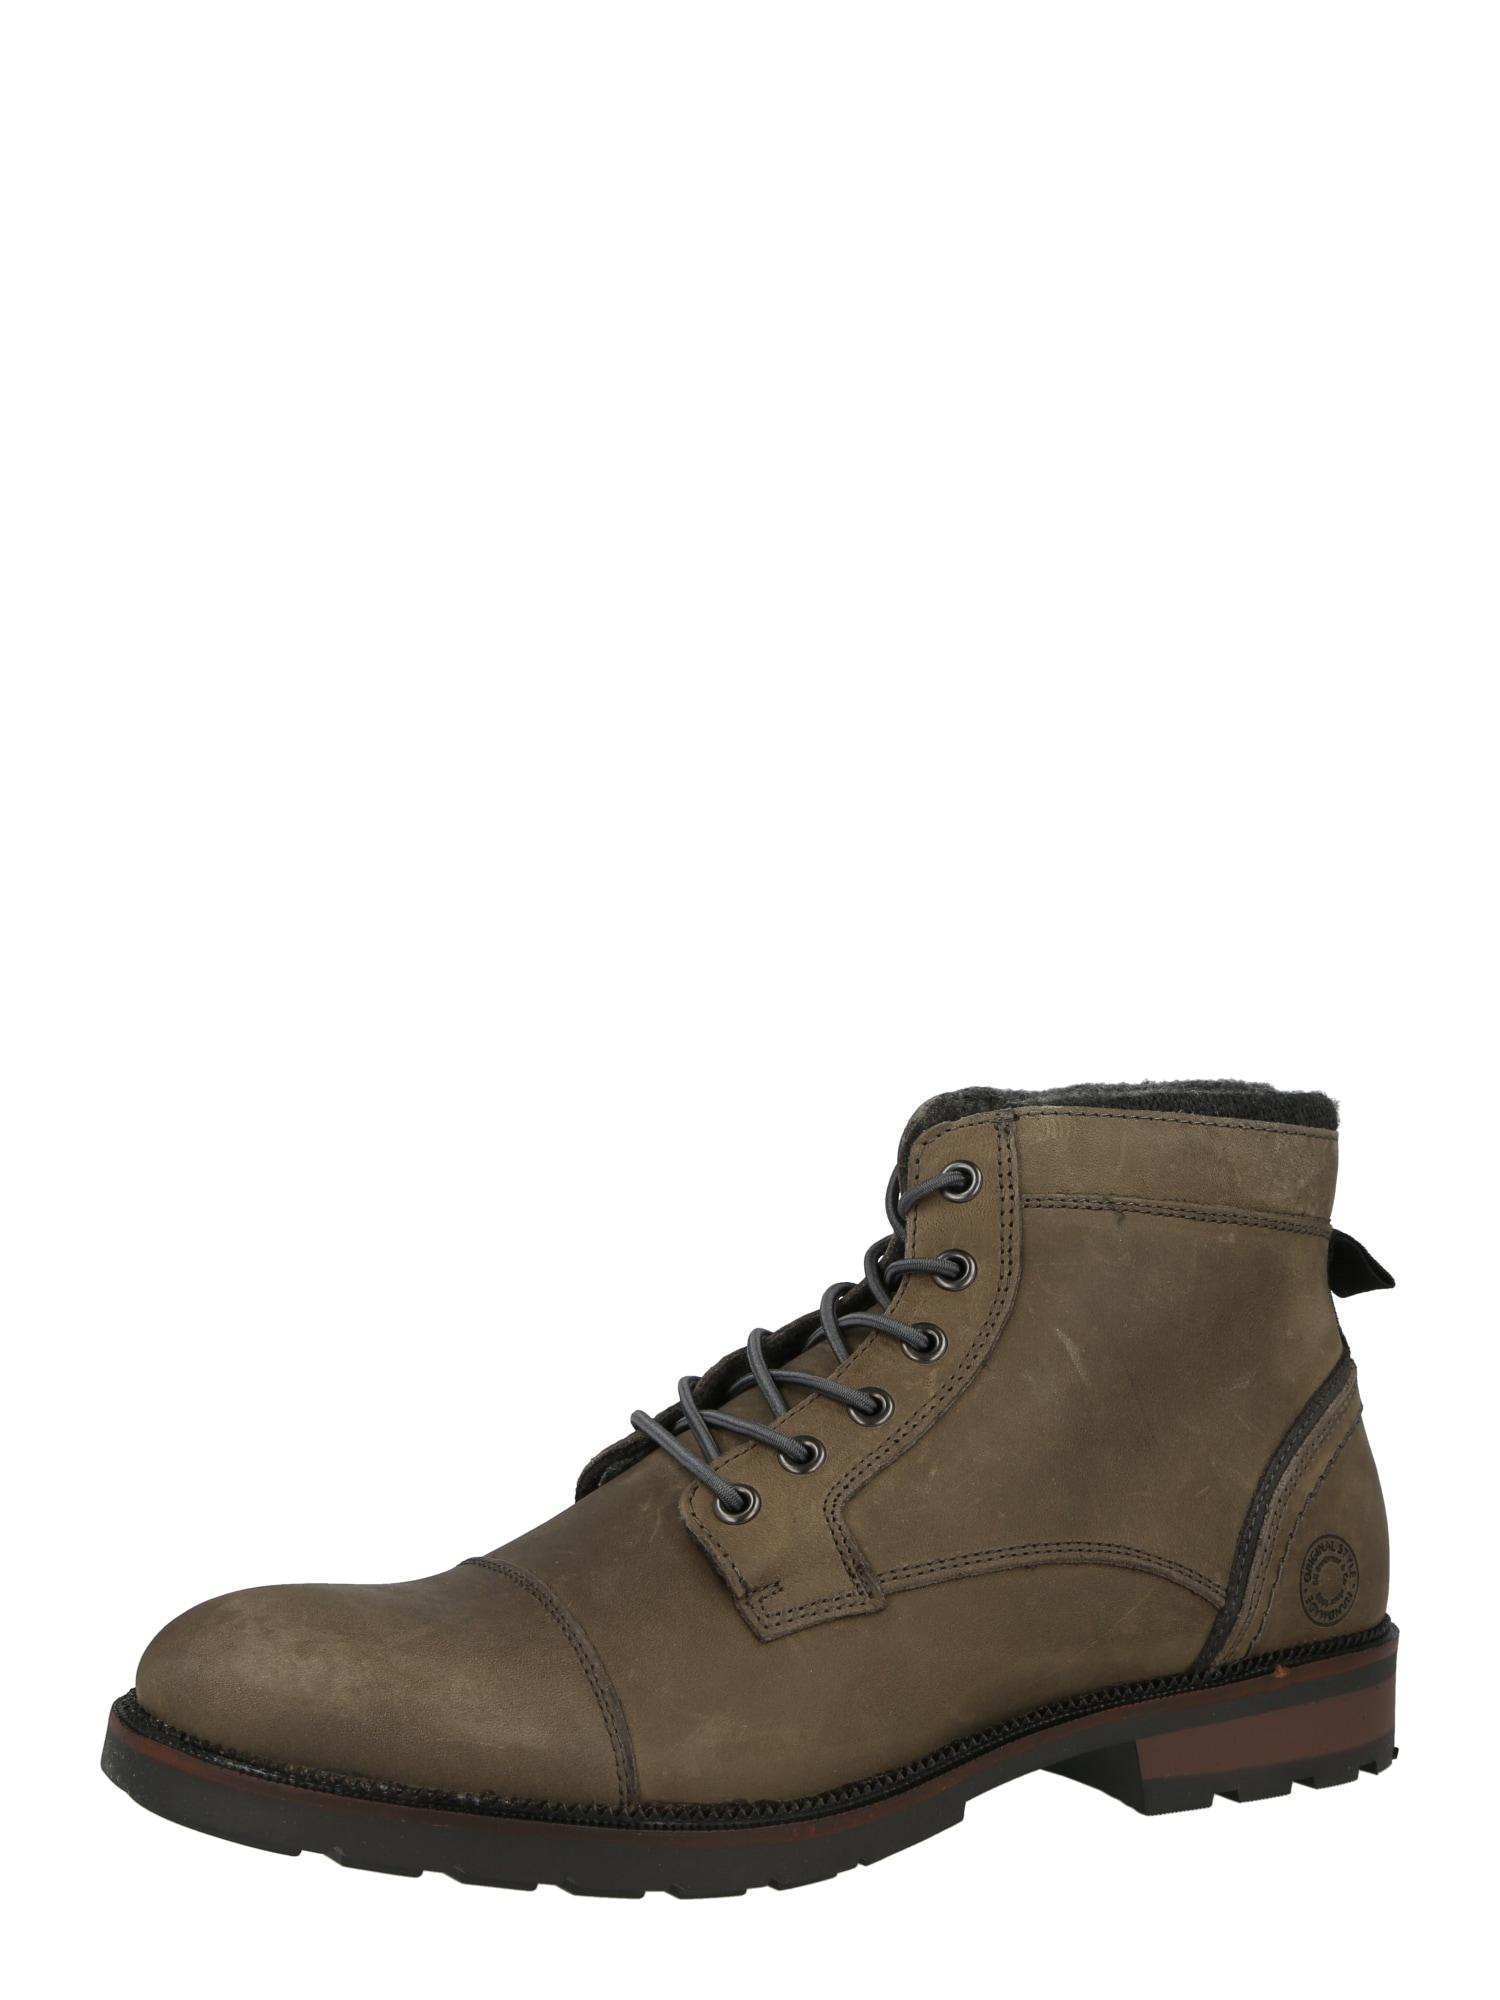 BULLBOXER Šněrovací boty  barvy bláta